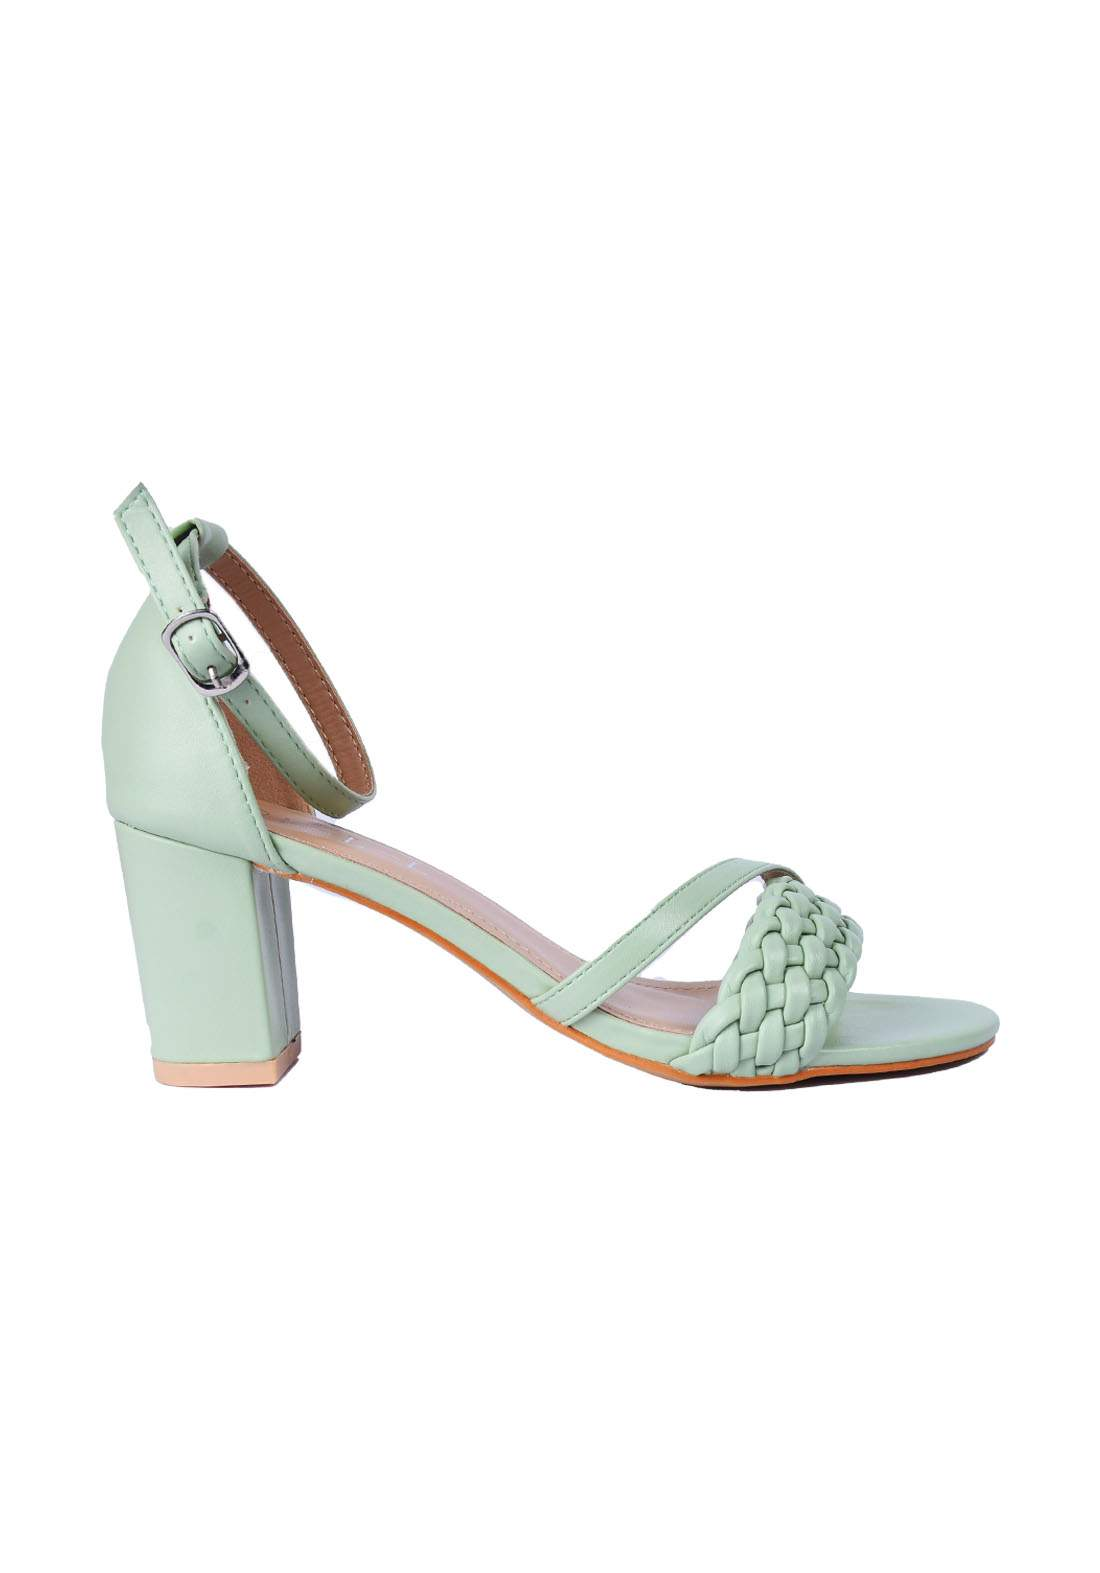 حذاء نسائي كعب 7 سم اخضر اللون